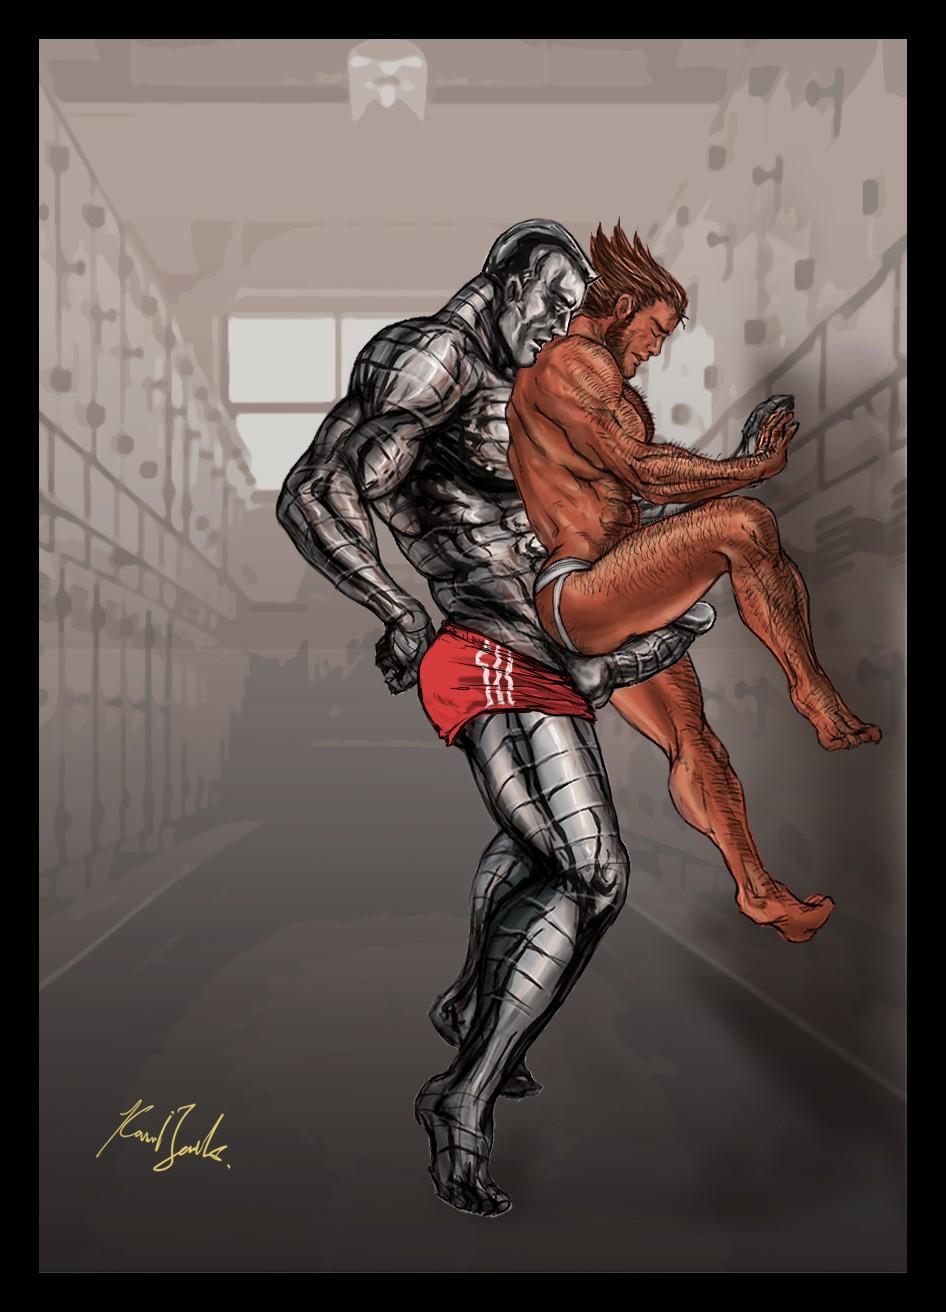 Гей Порно Комикс Росомаха